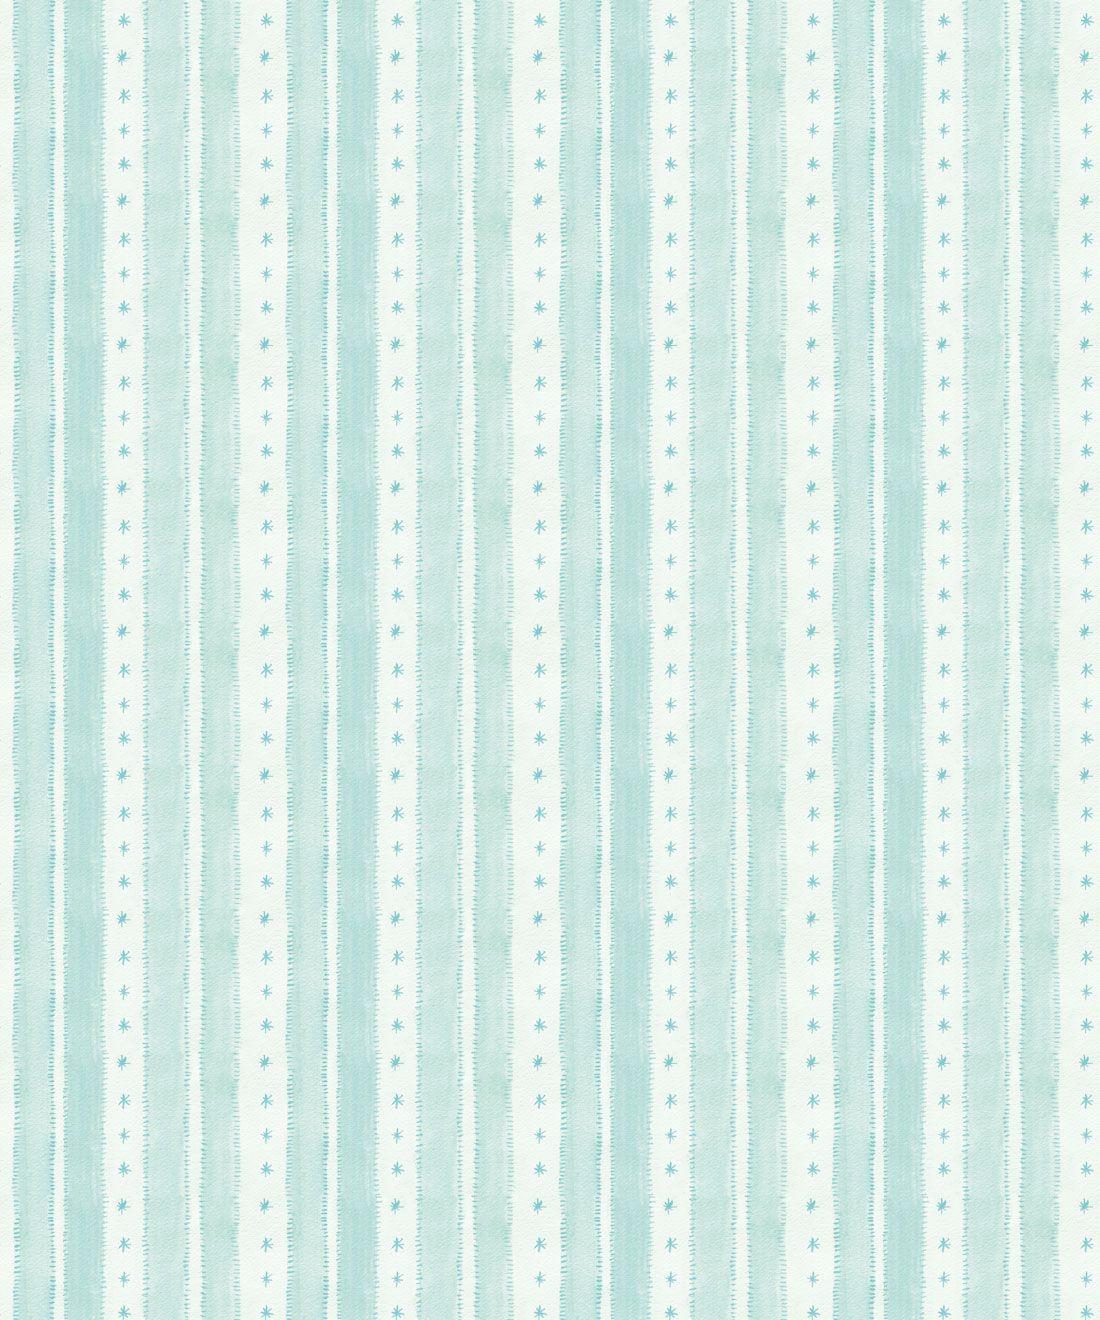 Star Stripe Wallpaper • Turquoise • Swatch